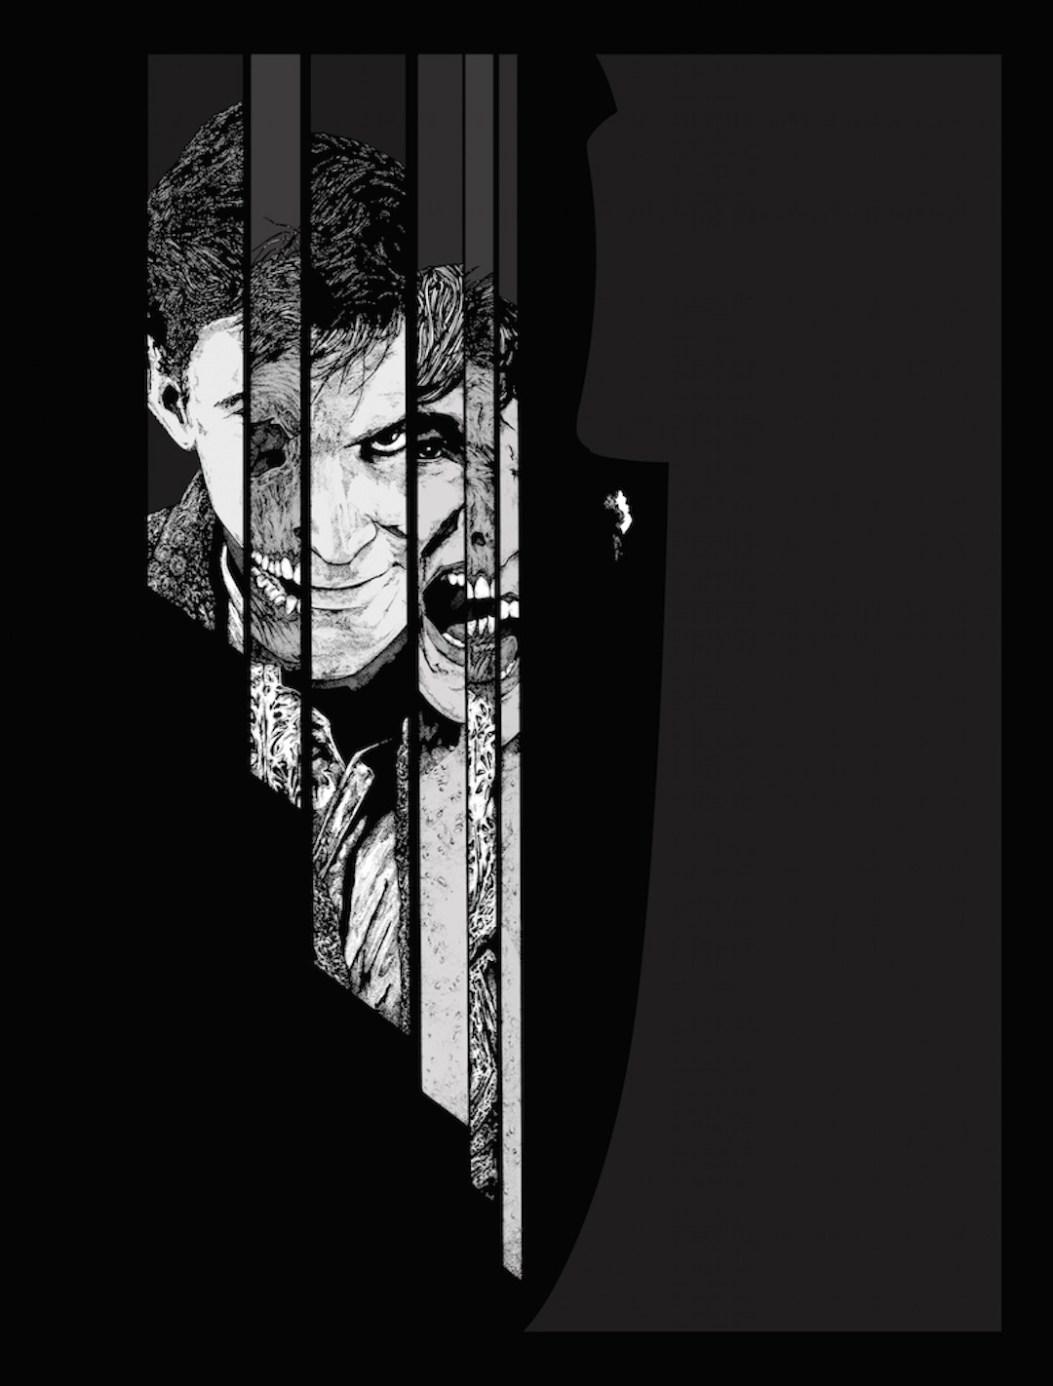 2D Black and White Psycho Illustration